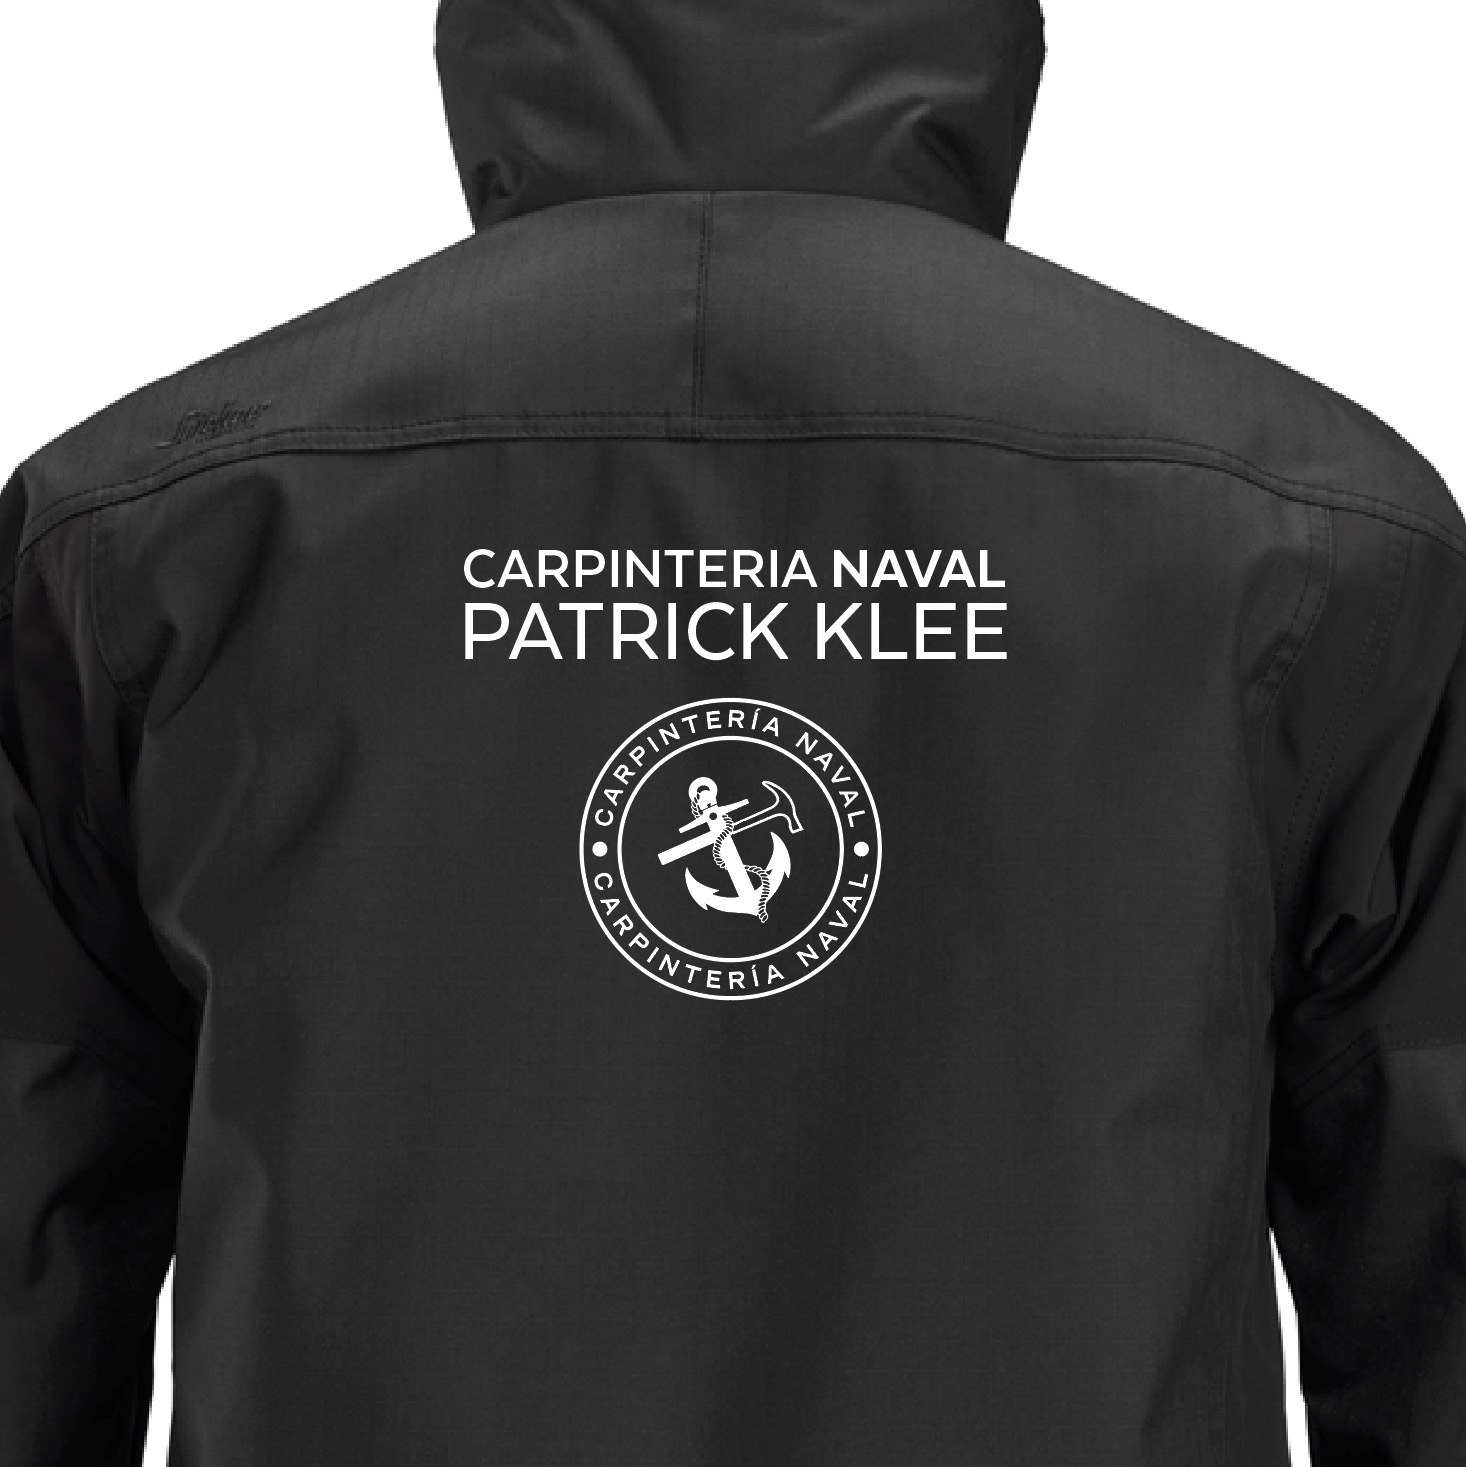 Patrick Klee – Carpintero Naval